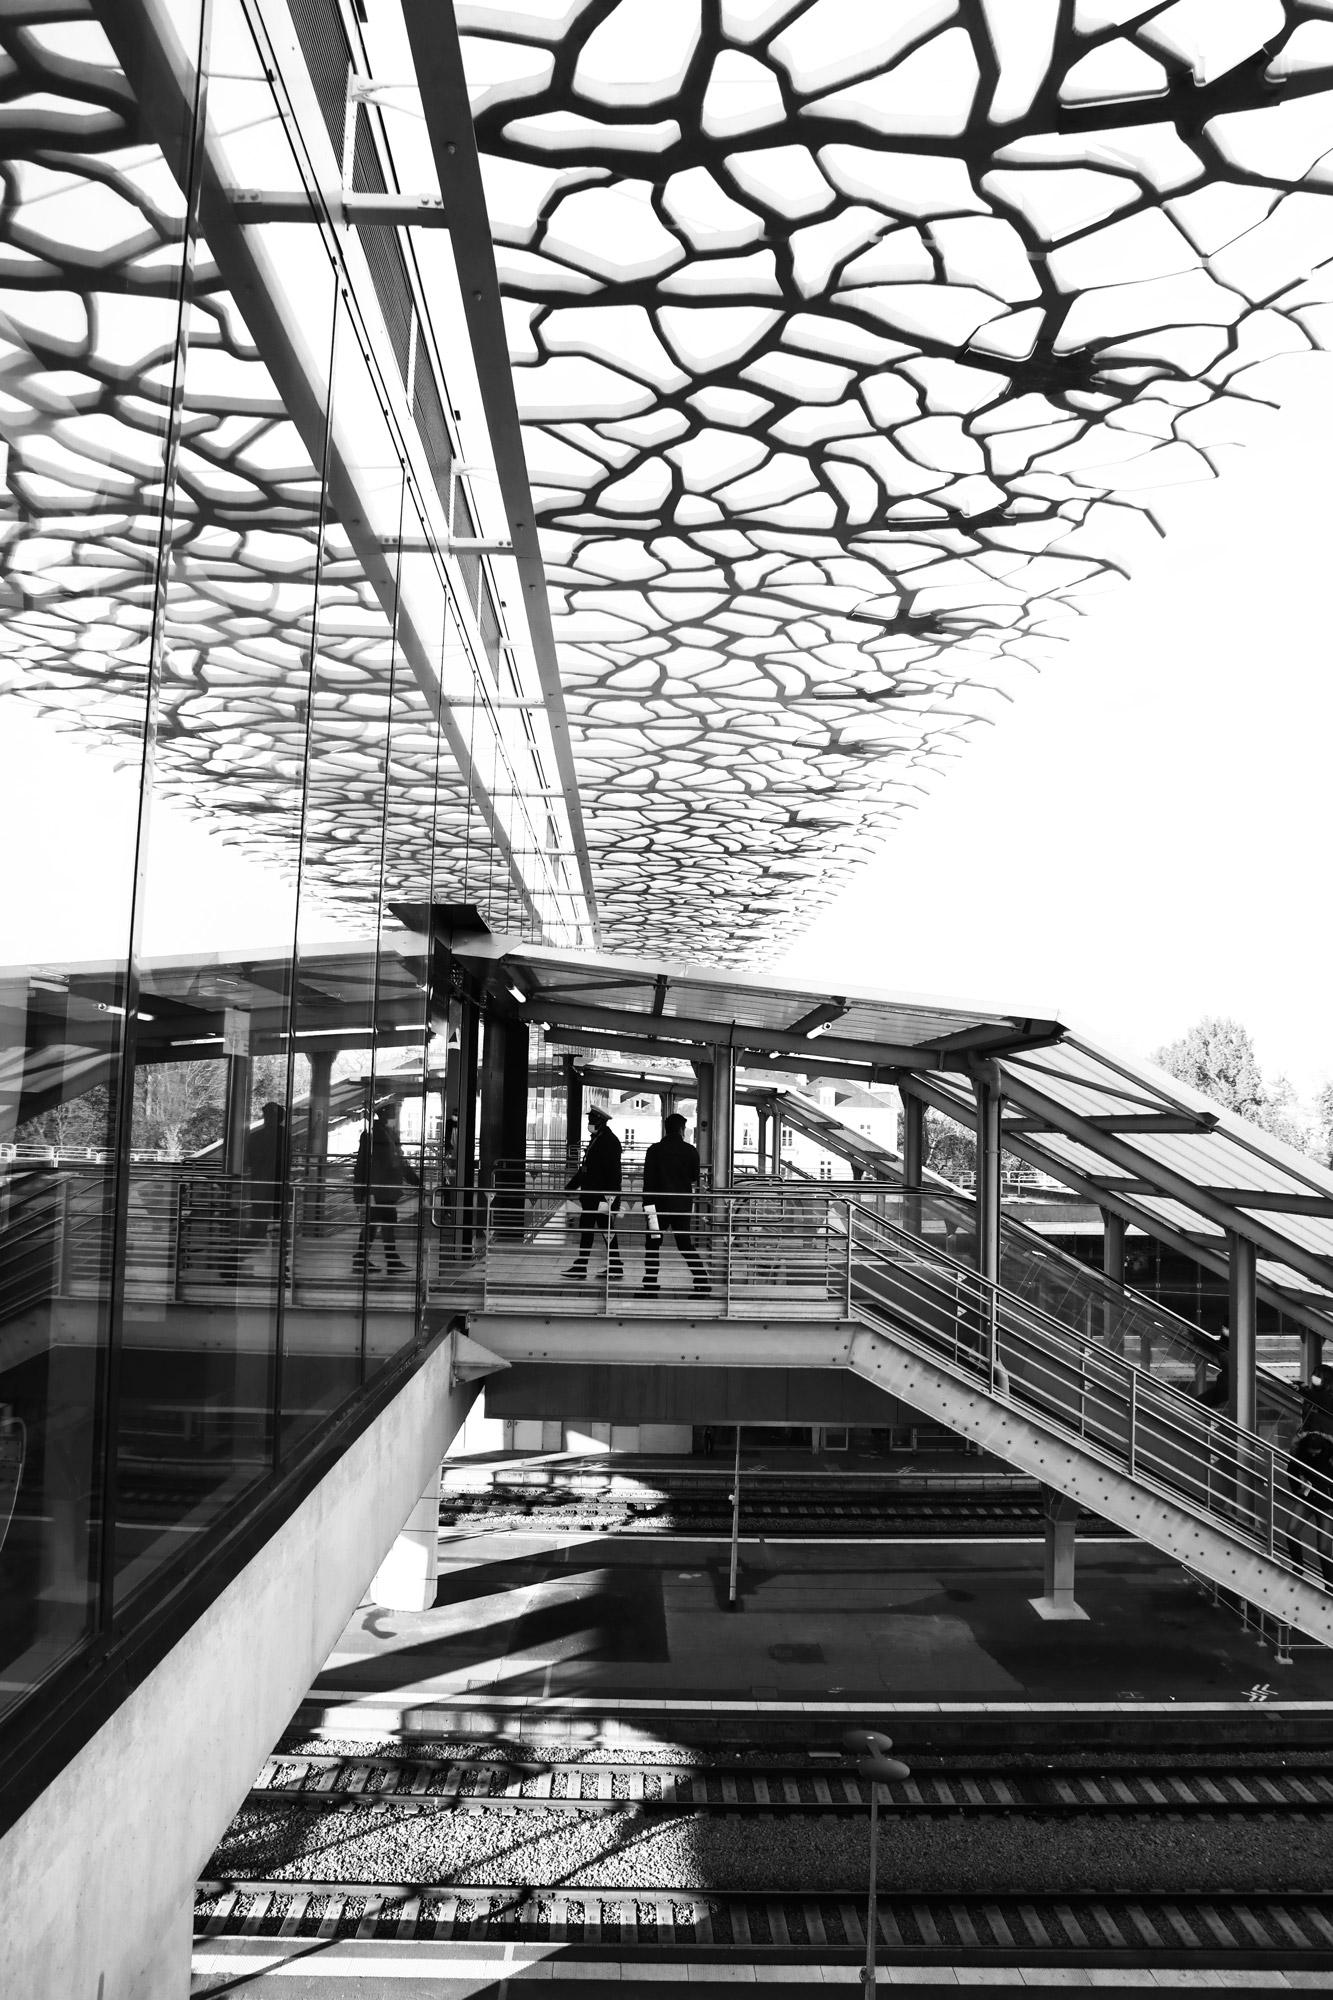 """On the go"" - Gare de Nantes. ©Clémence Rougetet"